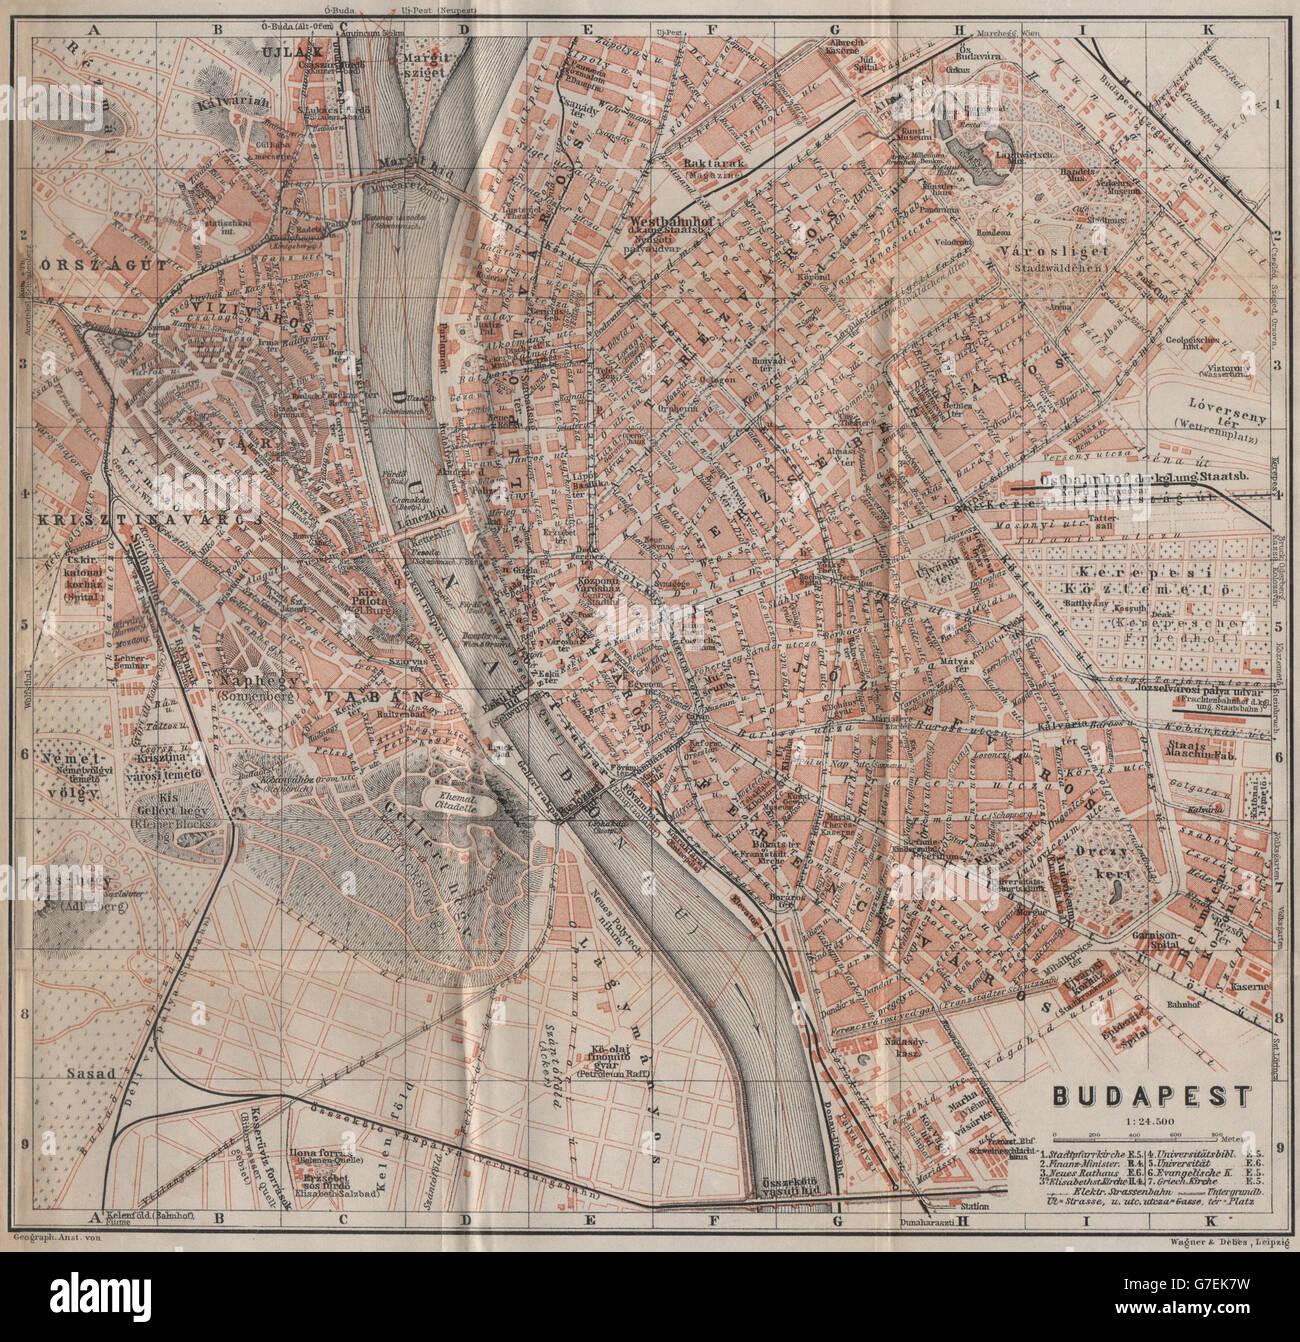 Budapest Antique Town City Plan Hungary Magyarorszag Terkep